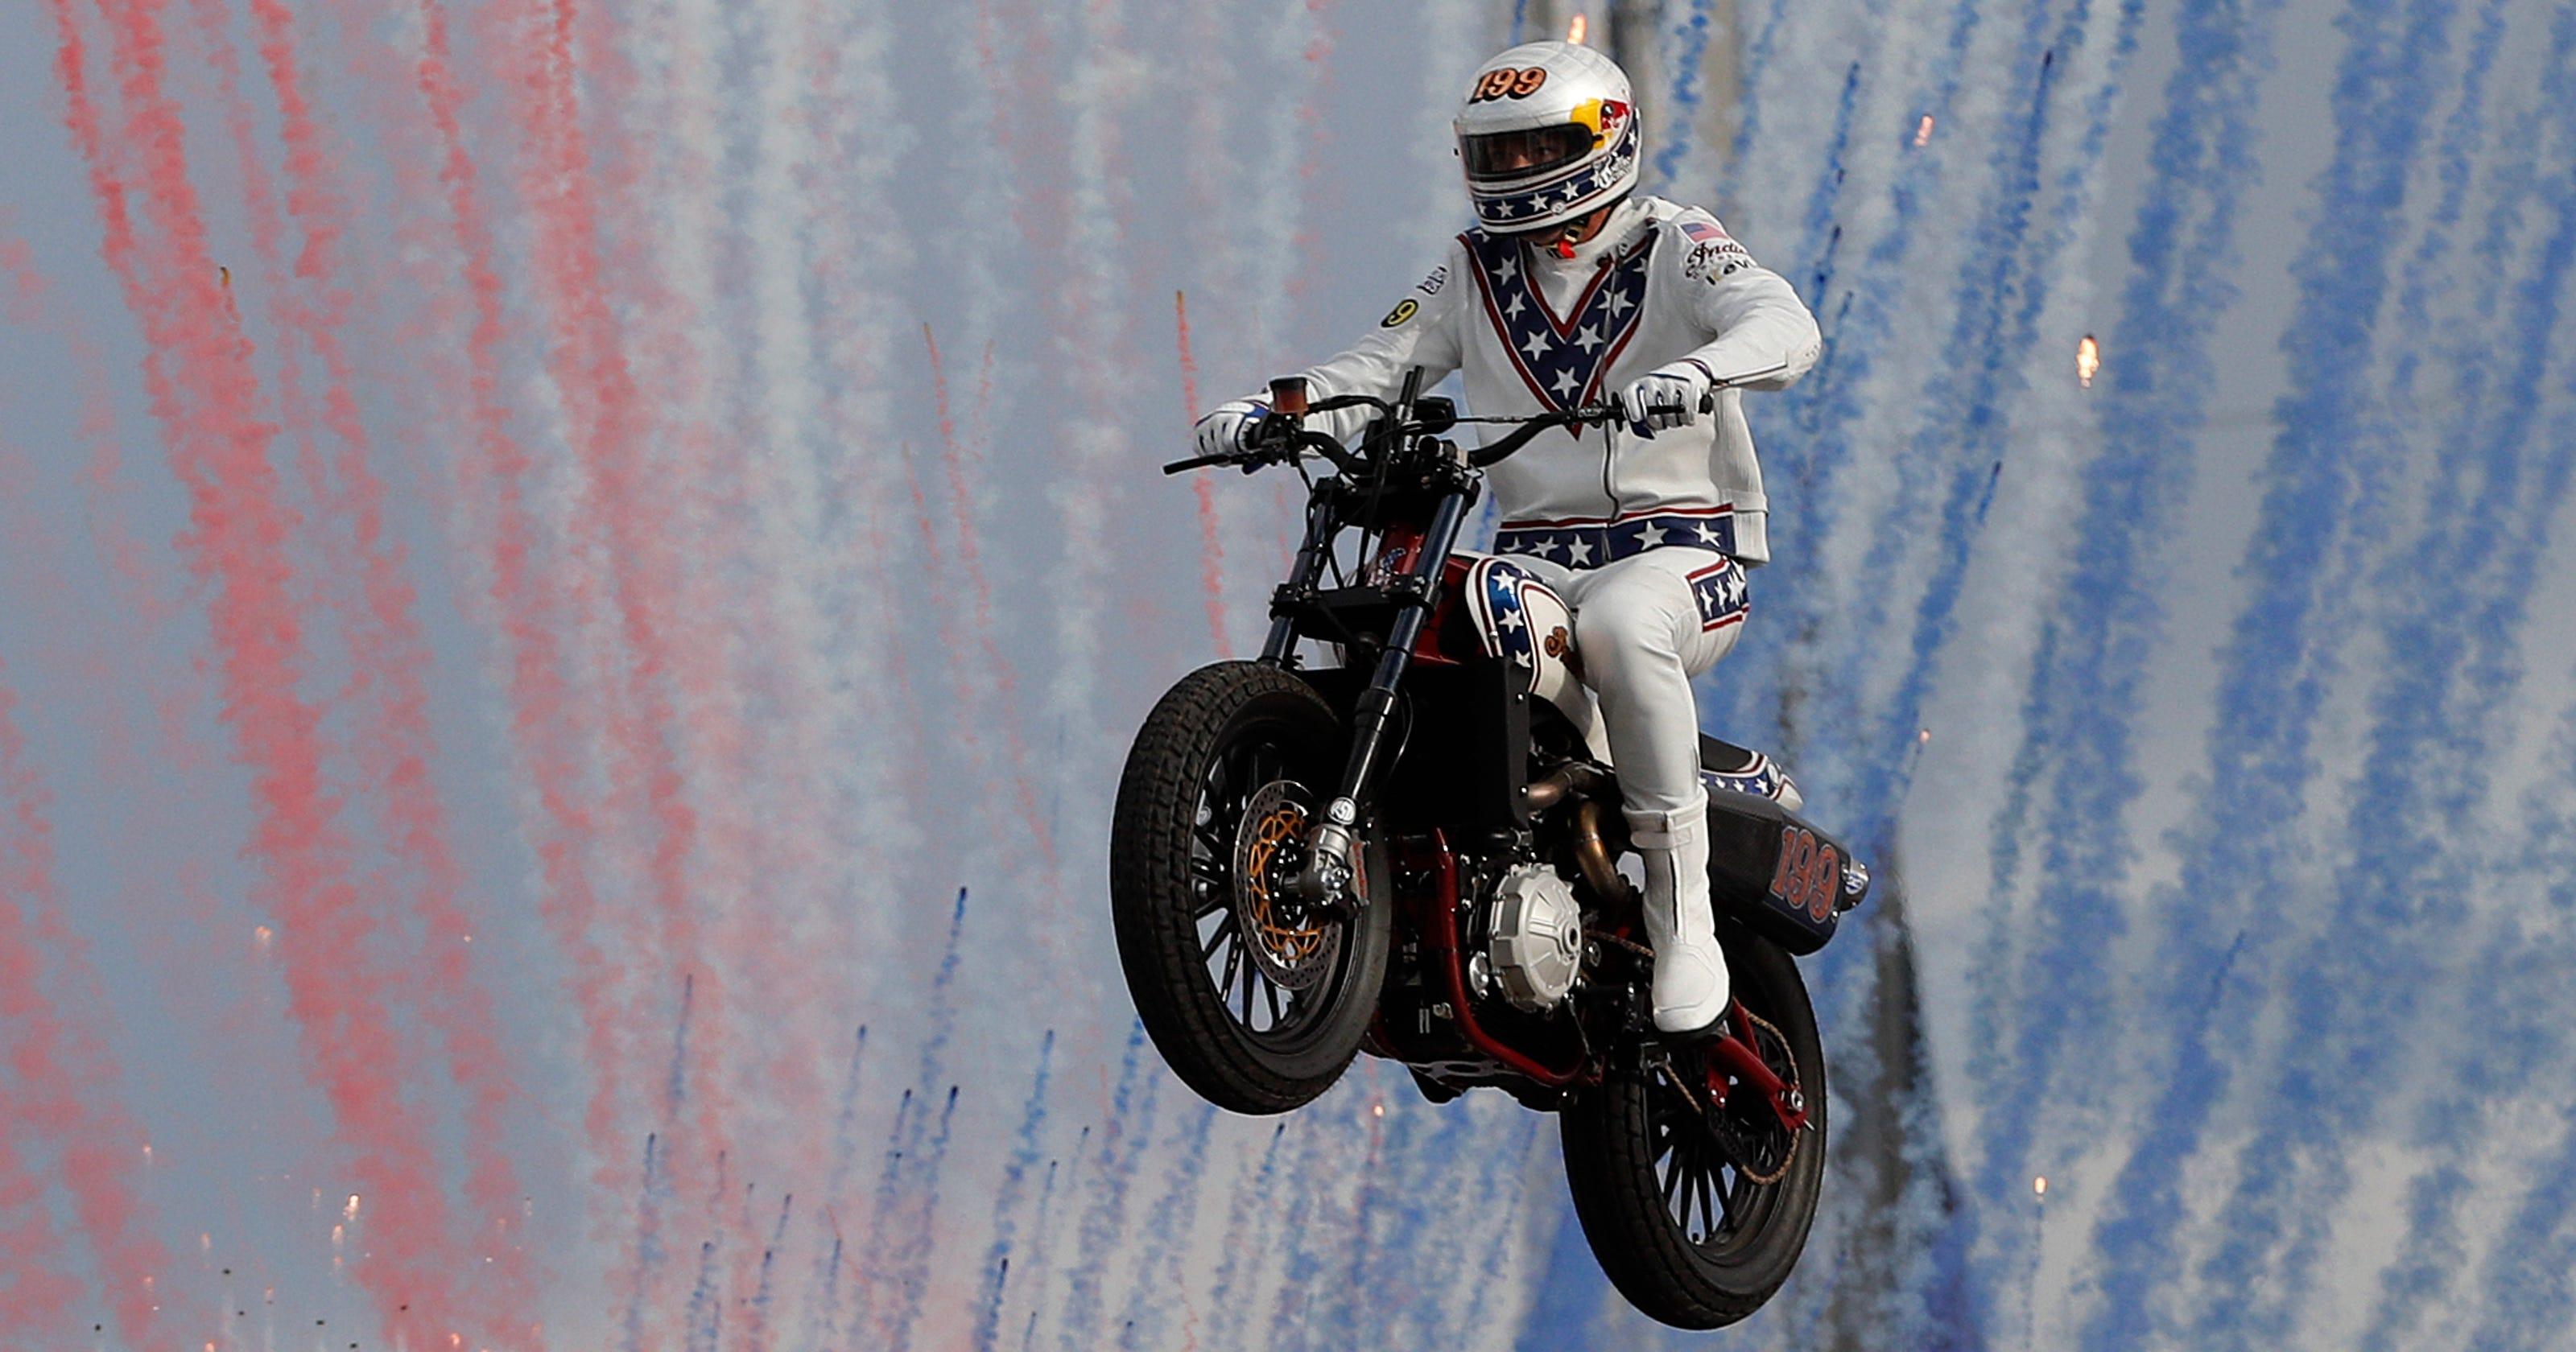 Evel Live: Travis Pastrana recreates 3 iconic Evel Knievel stunts